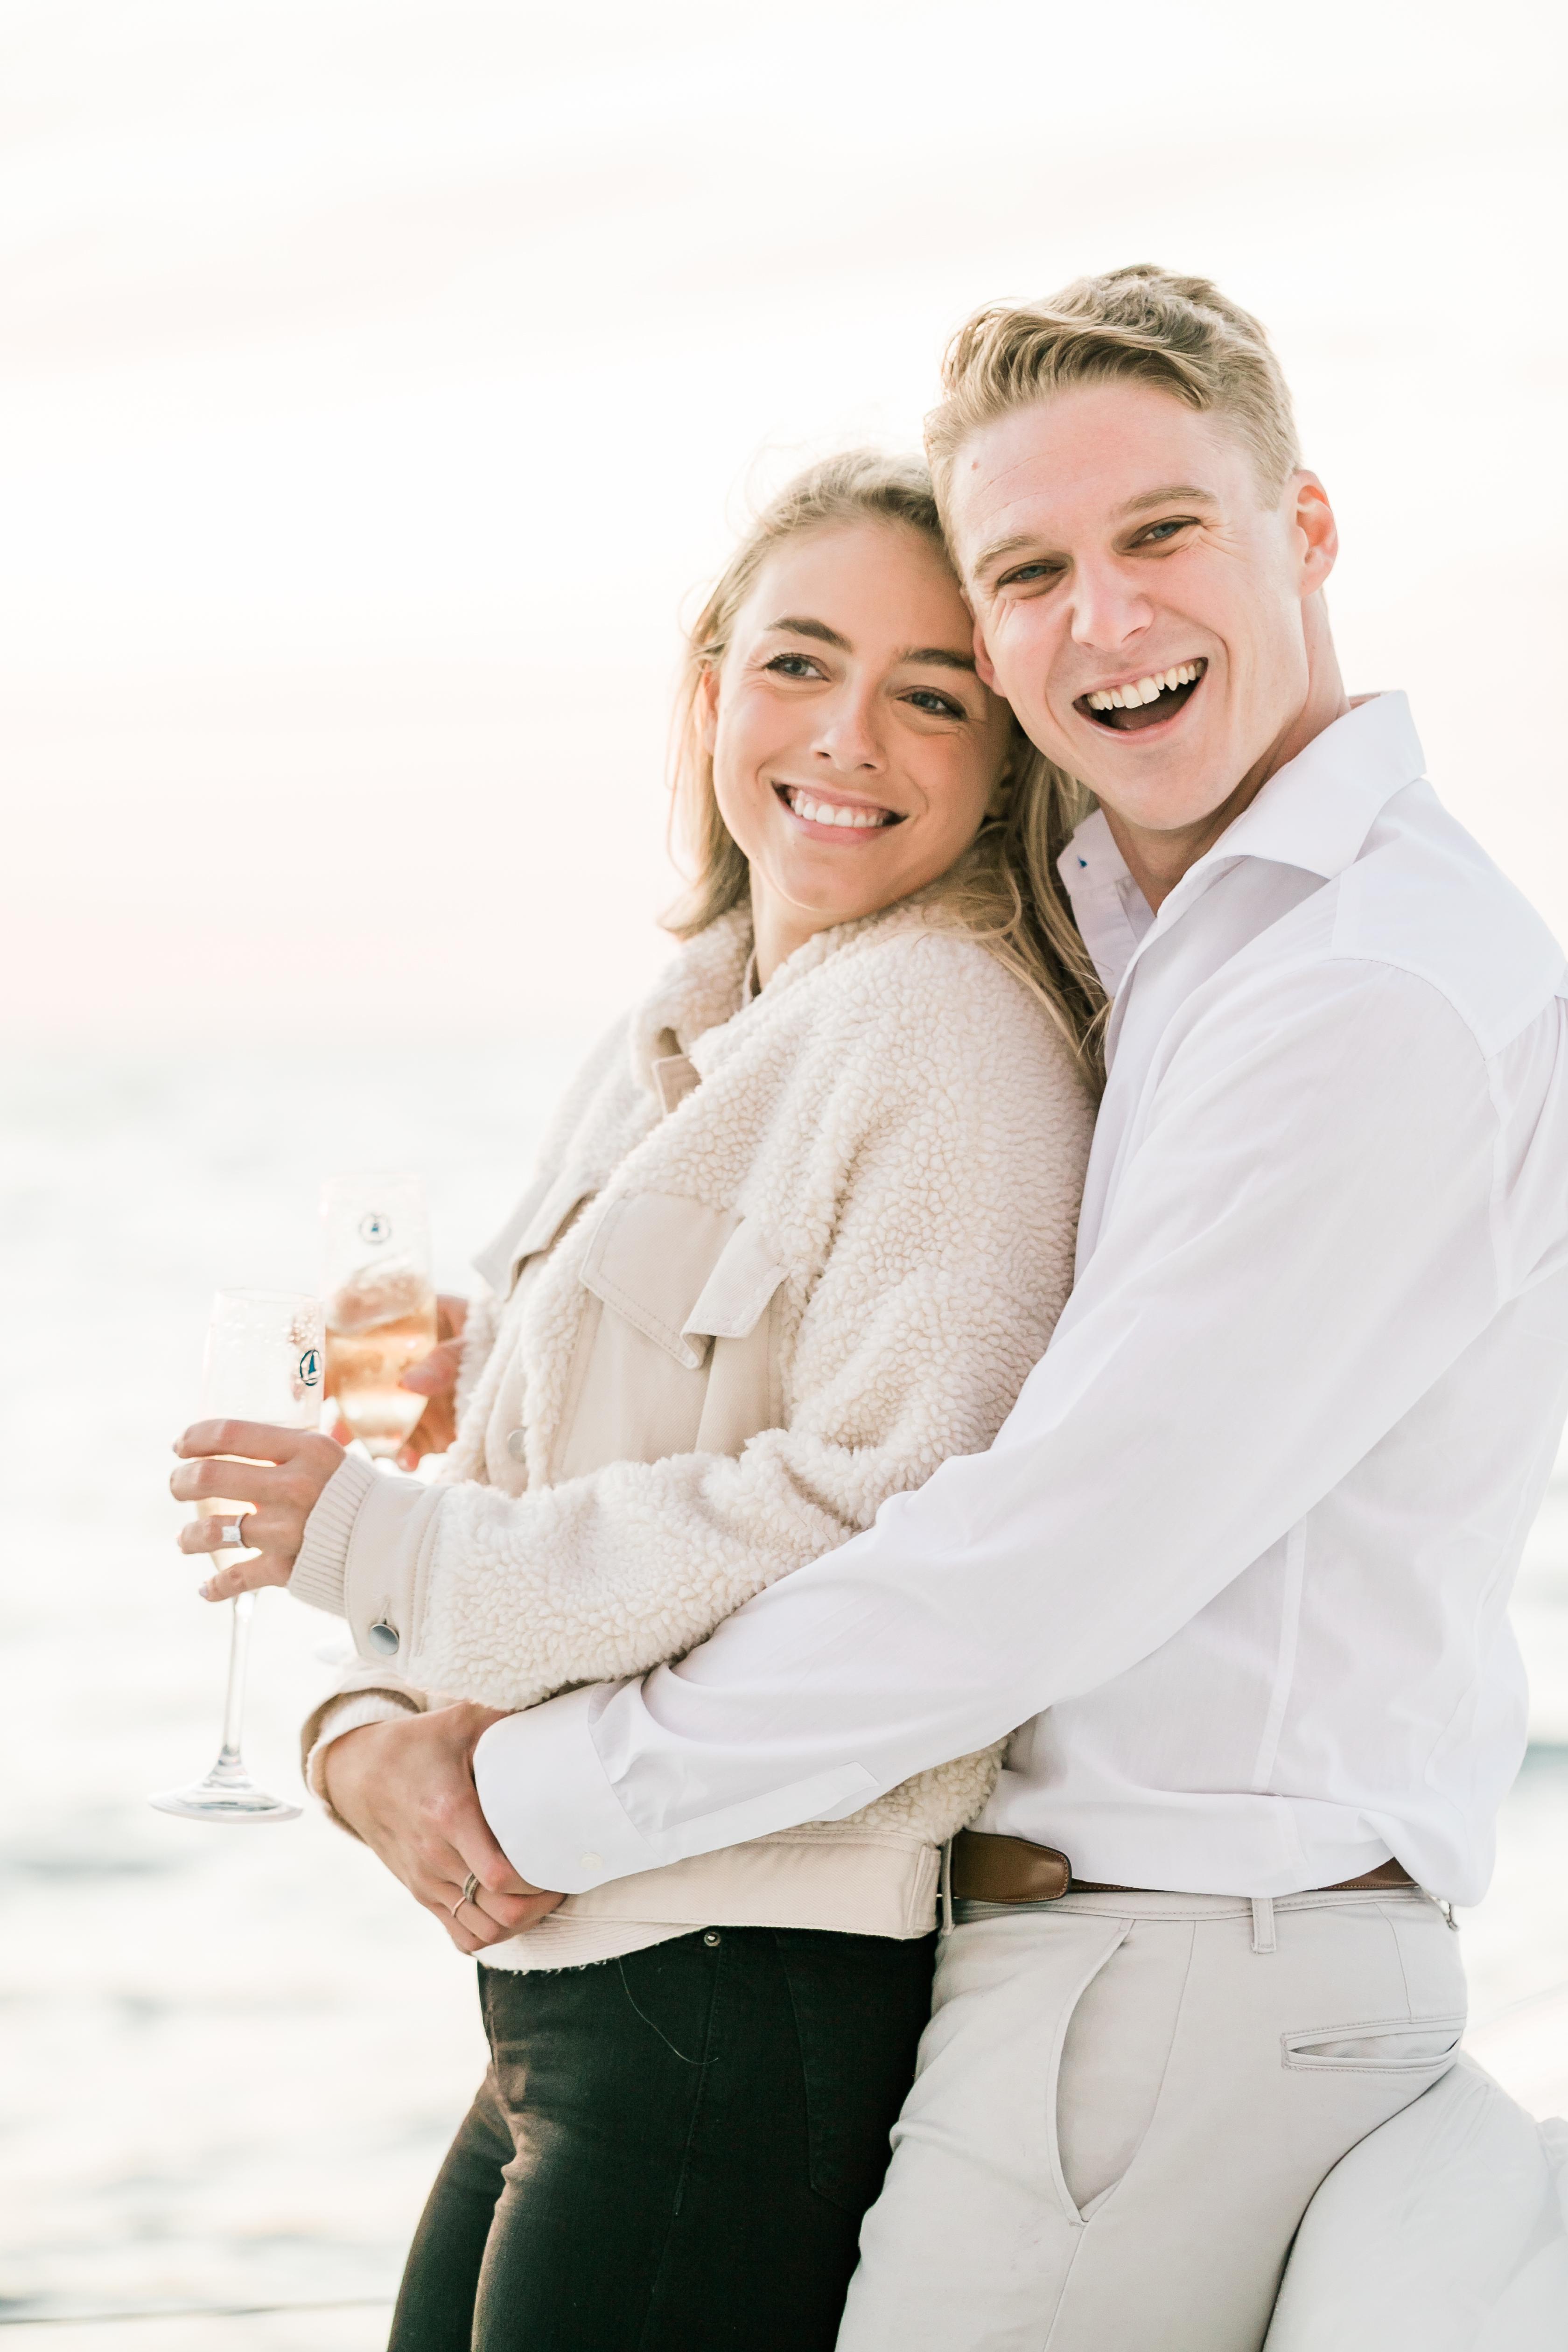 Phoebe's Proposal in Marina Del Rey, California